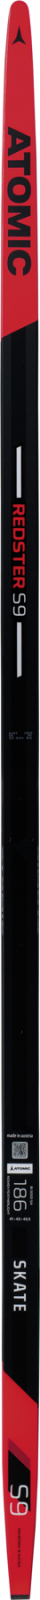 Atomic Redster S9 Soft/Medium